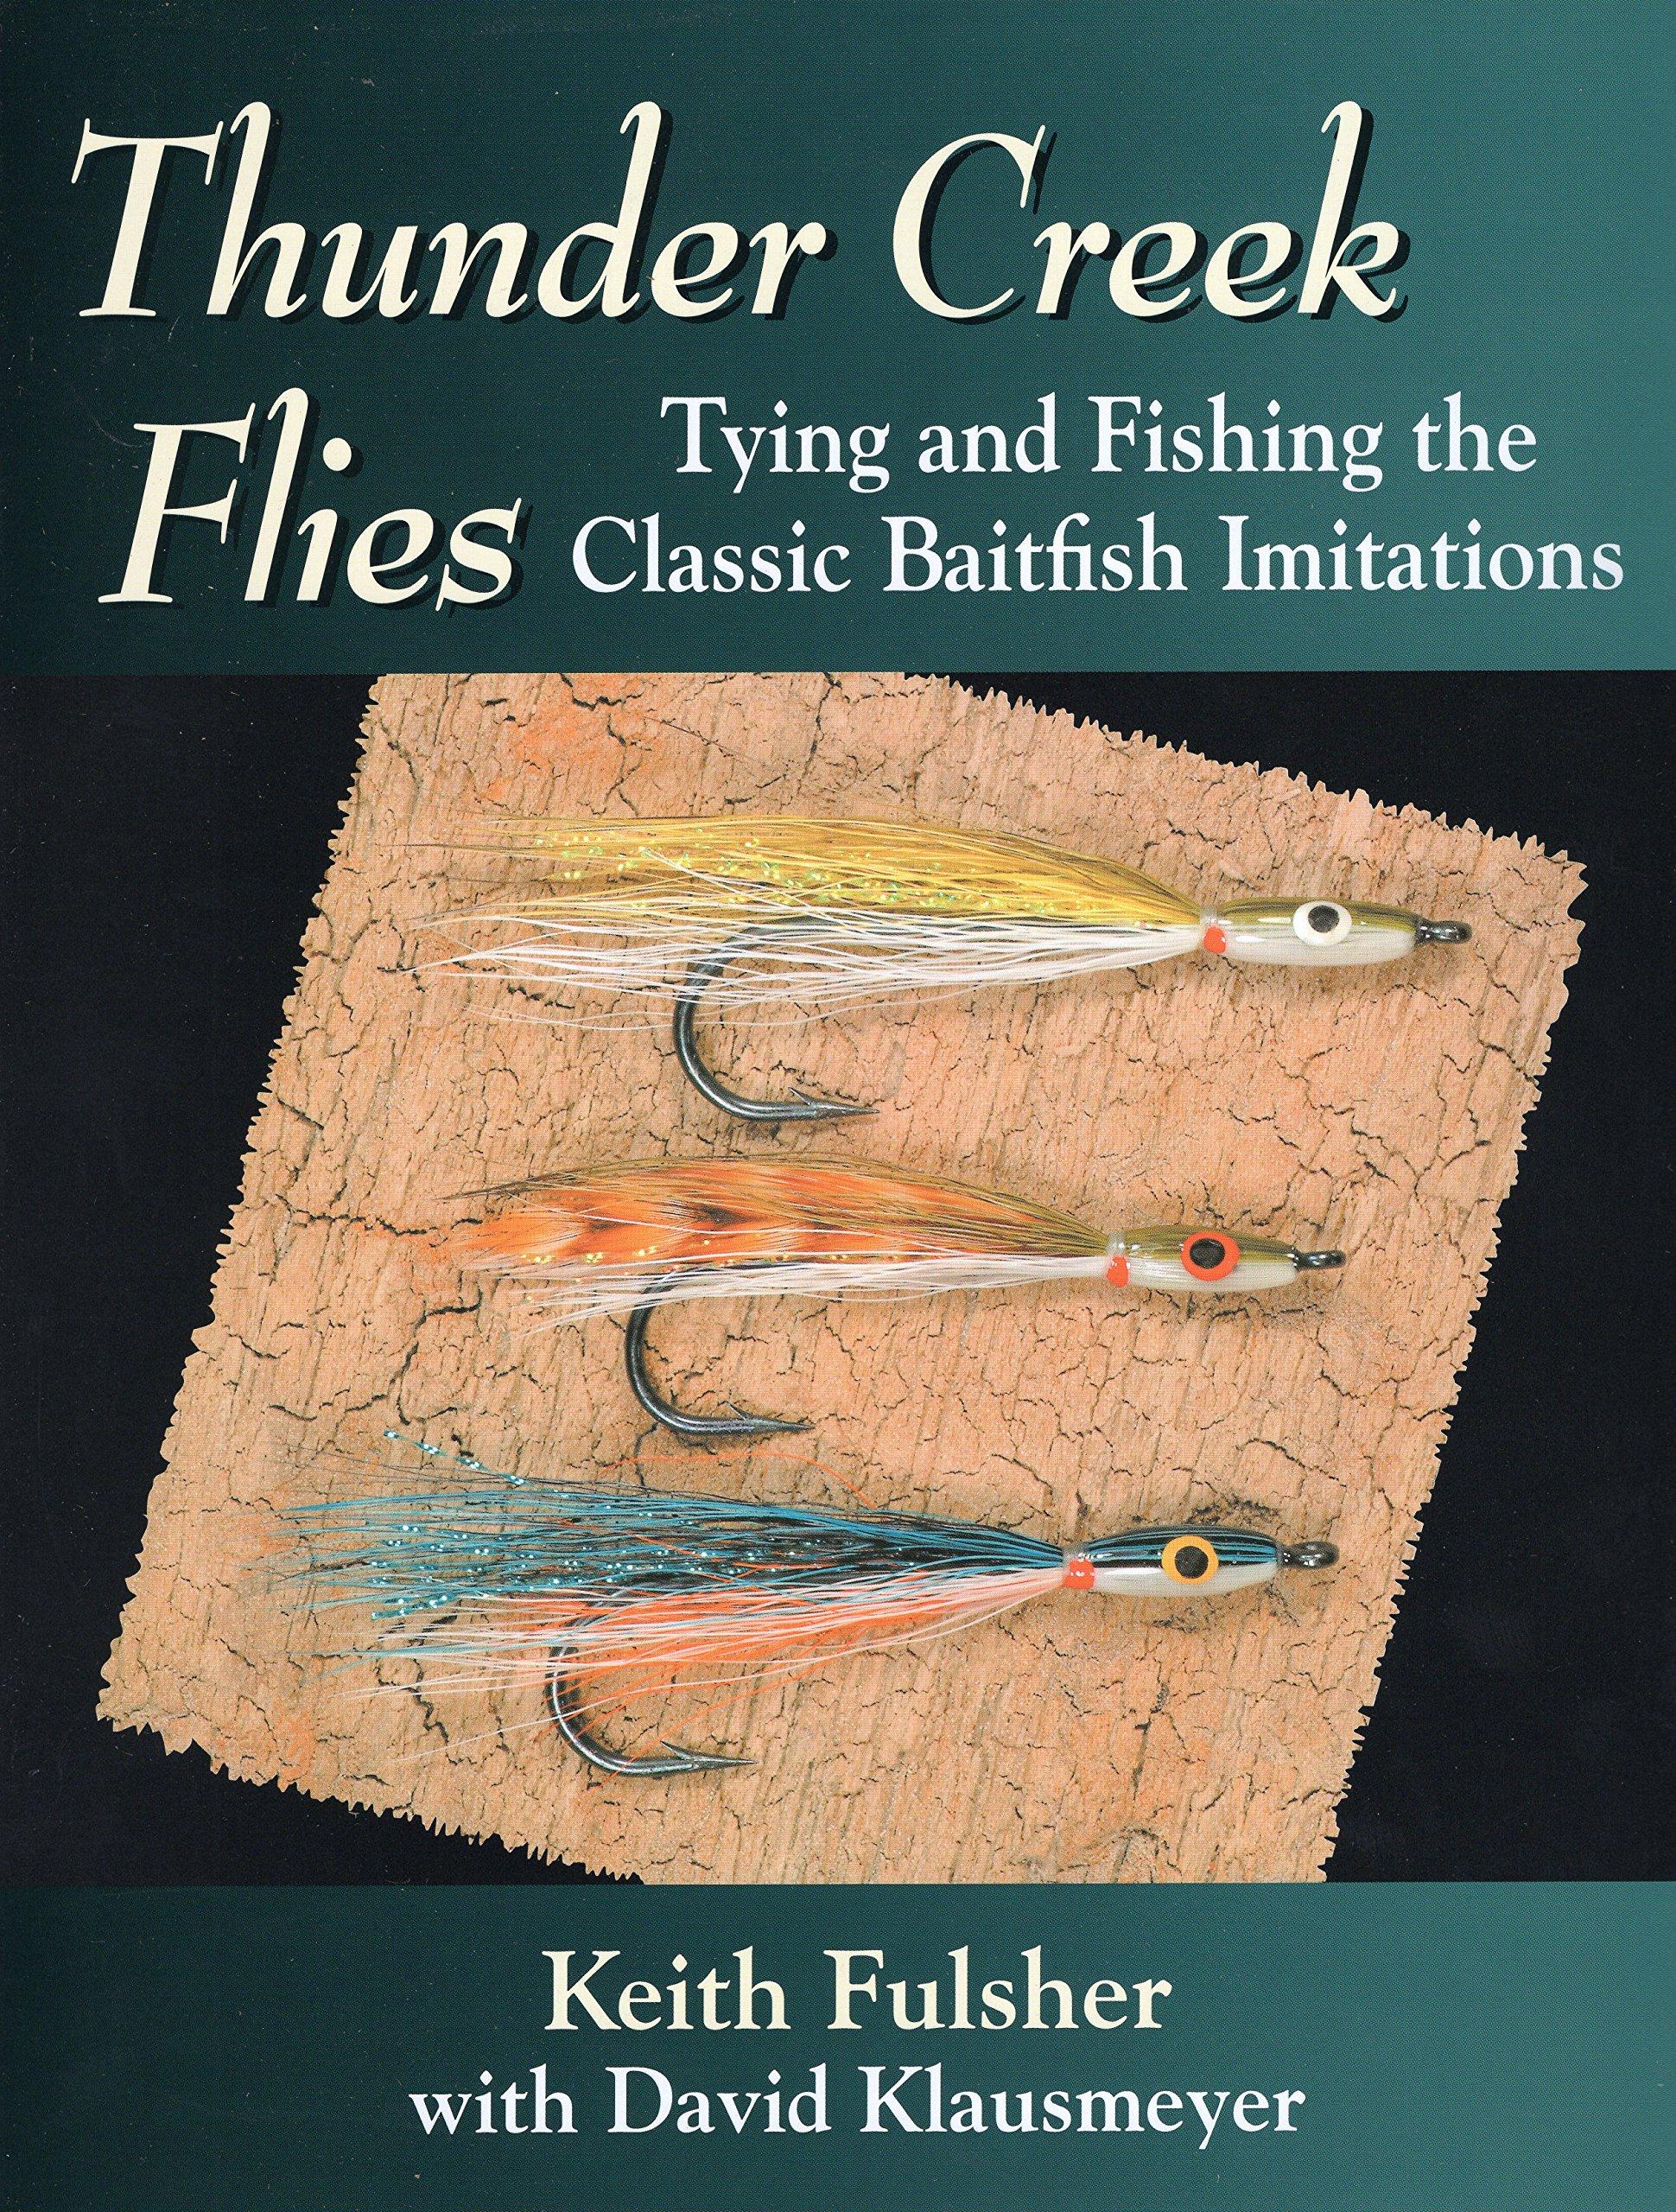 Read Online Thunder Creek Flies: Tying and Fishing the Classic Baitfish Imitations PDF ePub book